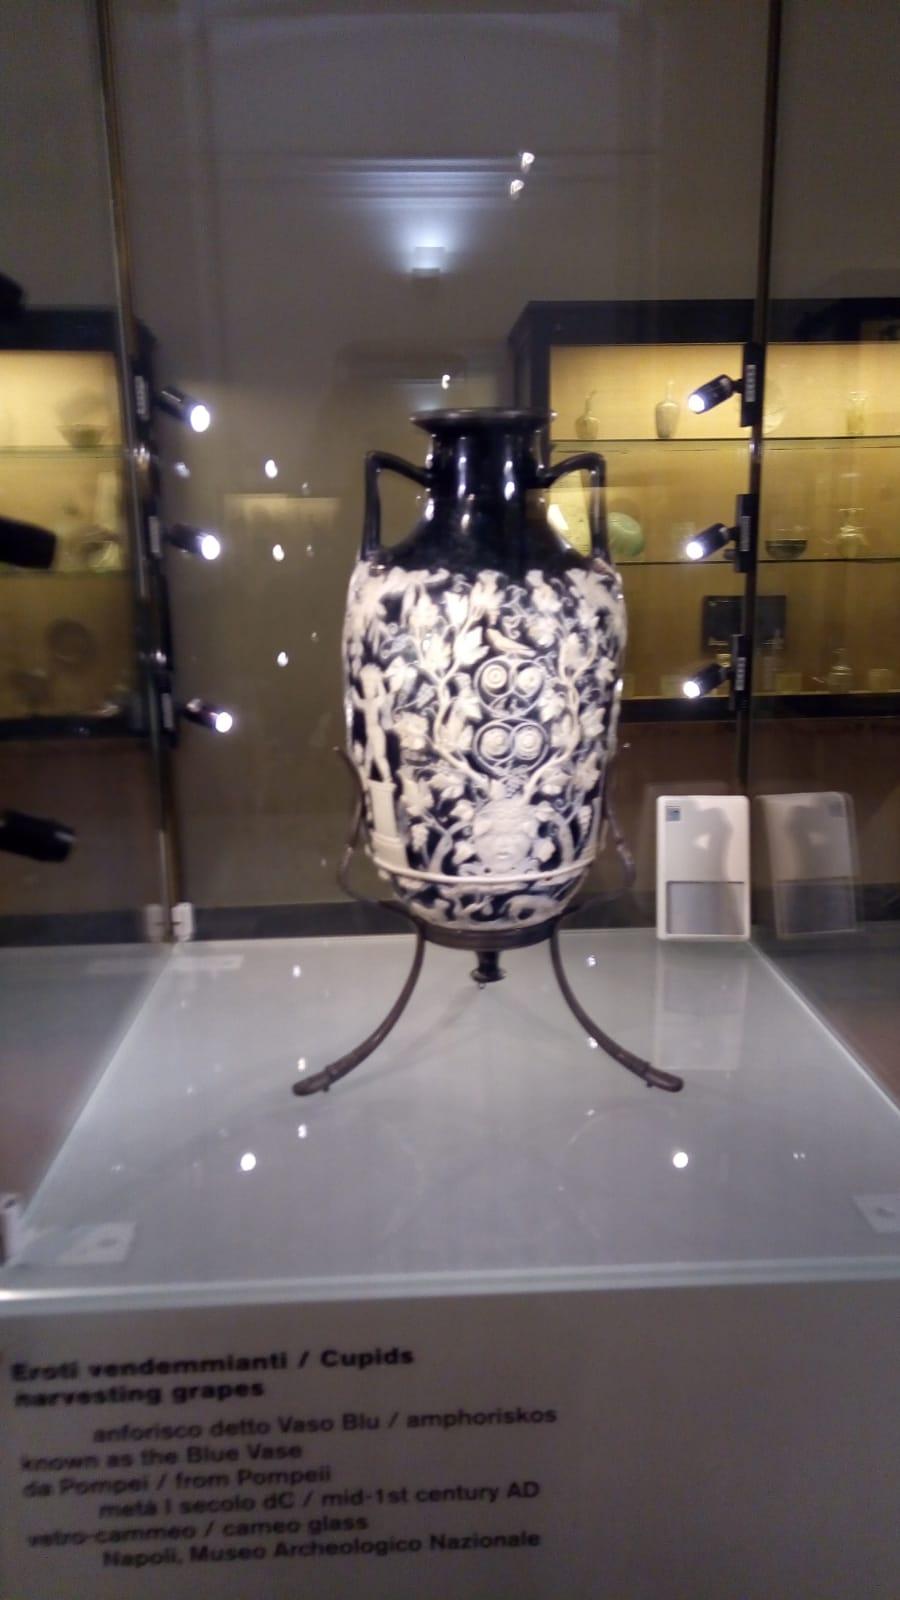 Museo Nazionale di Archeologia foto1